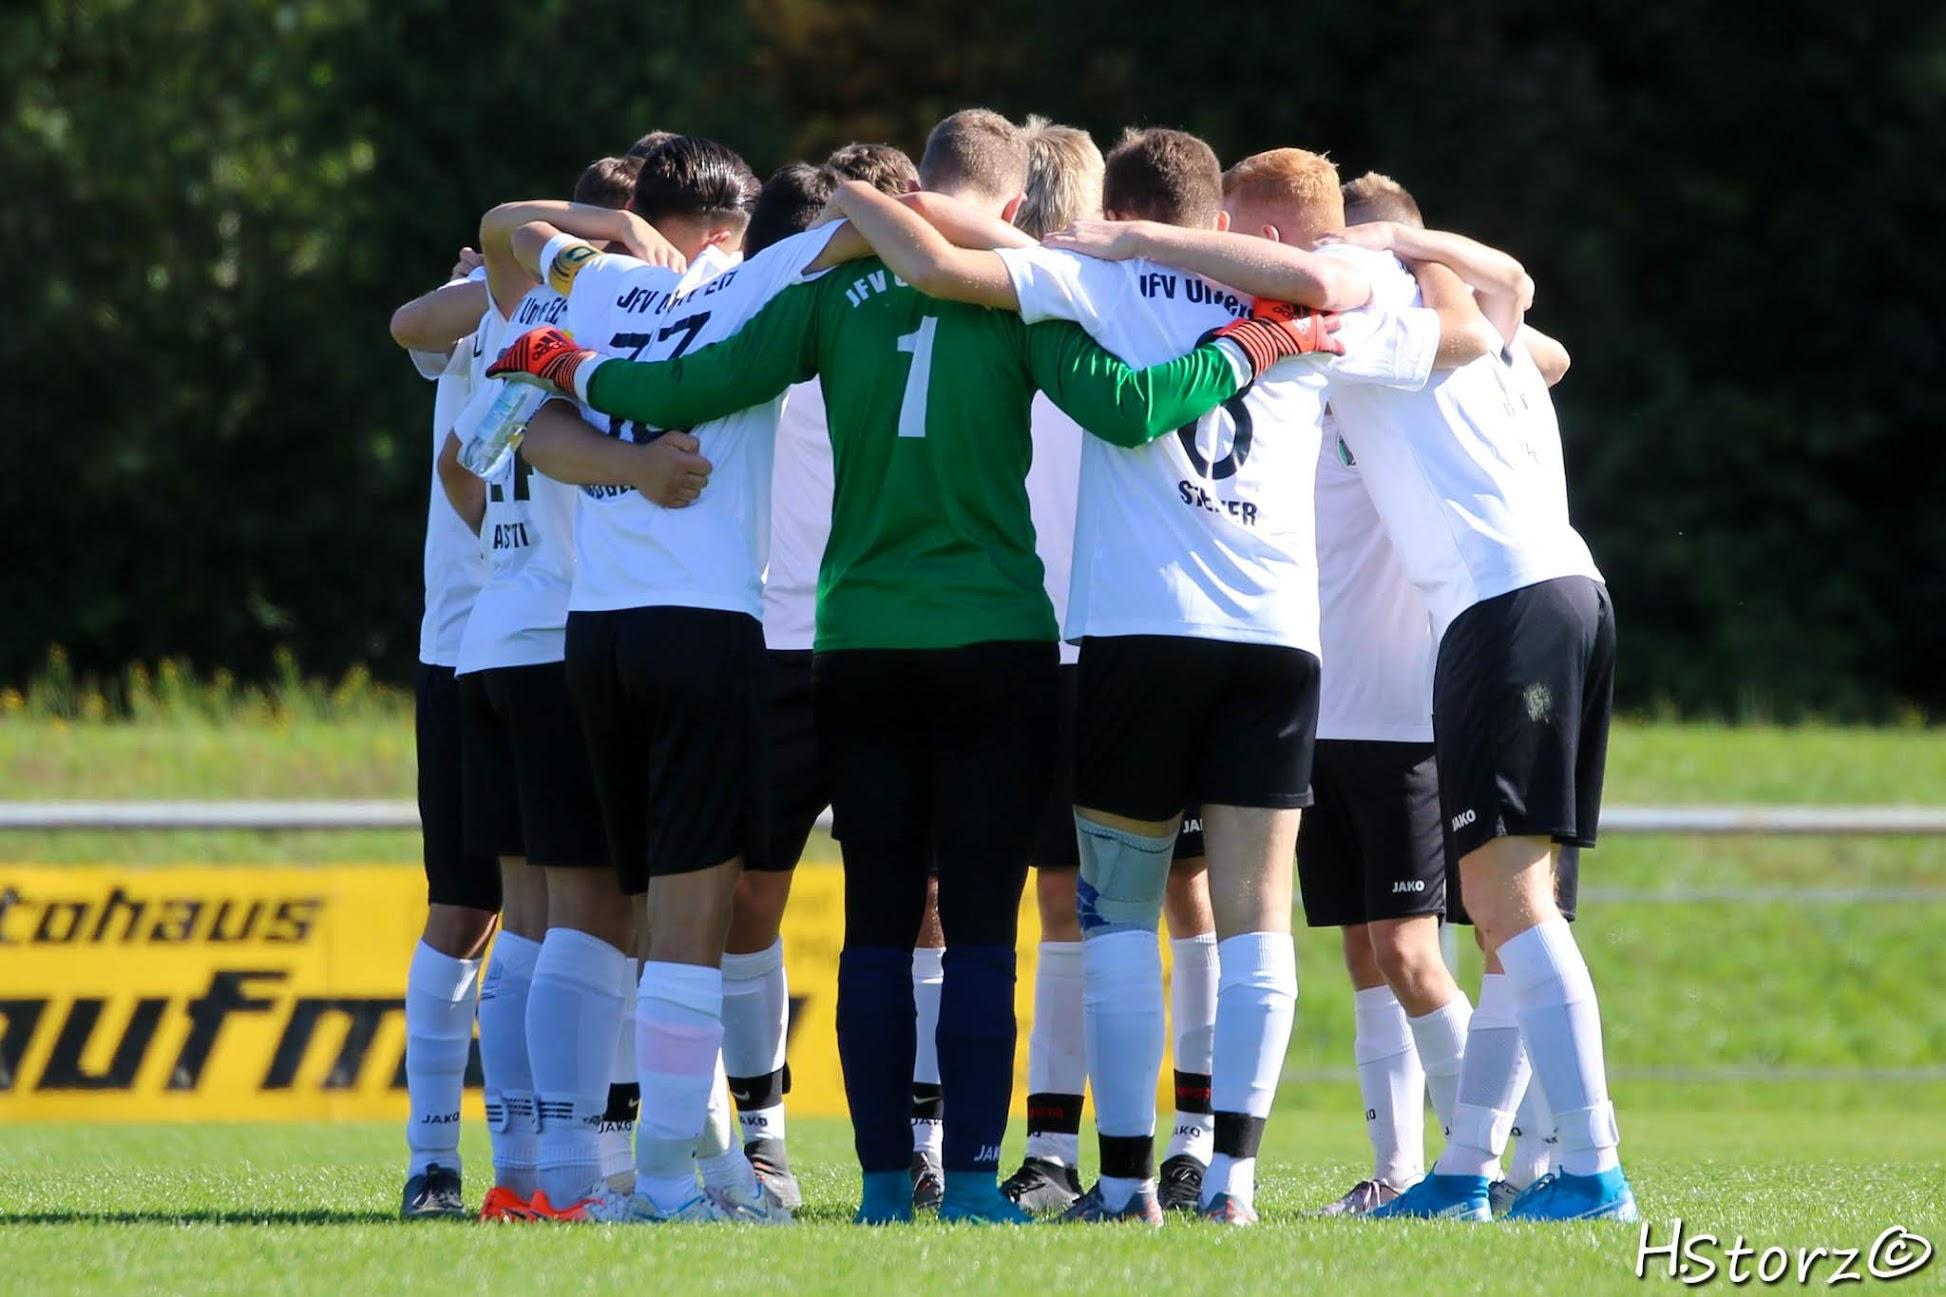 Verbands-Pokal B1-JFV Untere Elz – SC Freiburg   0:12 (0:7)